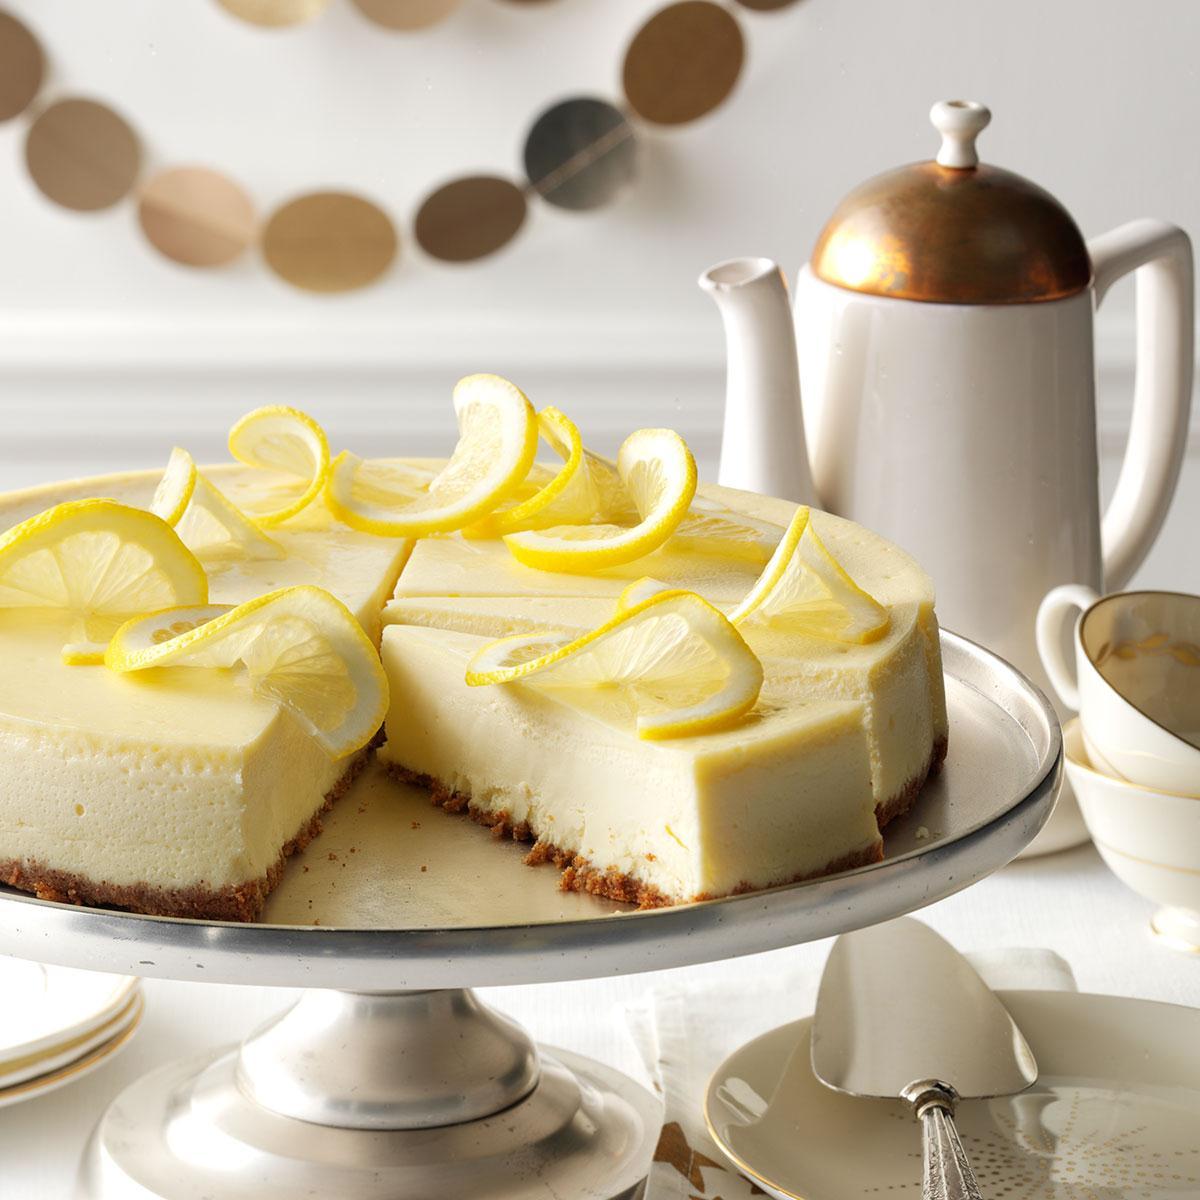 Lovely Lemon Cheesecake image